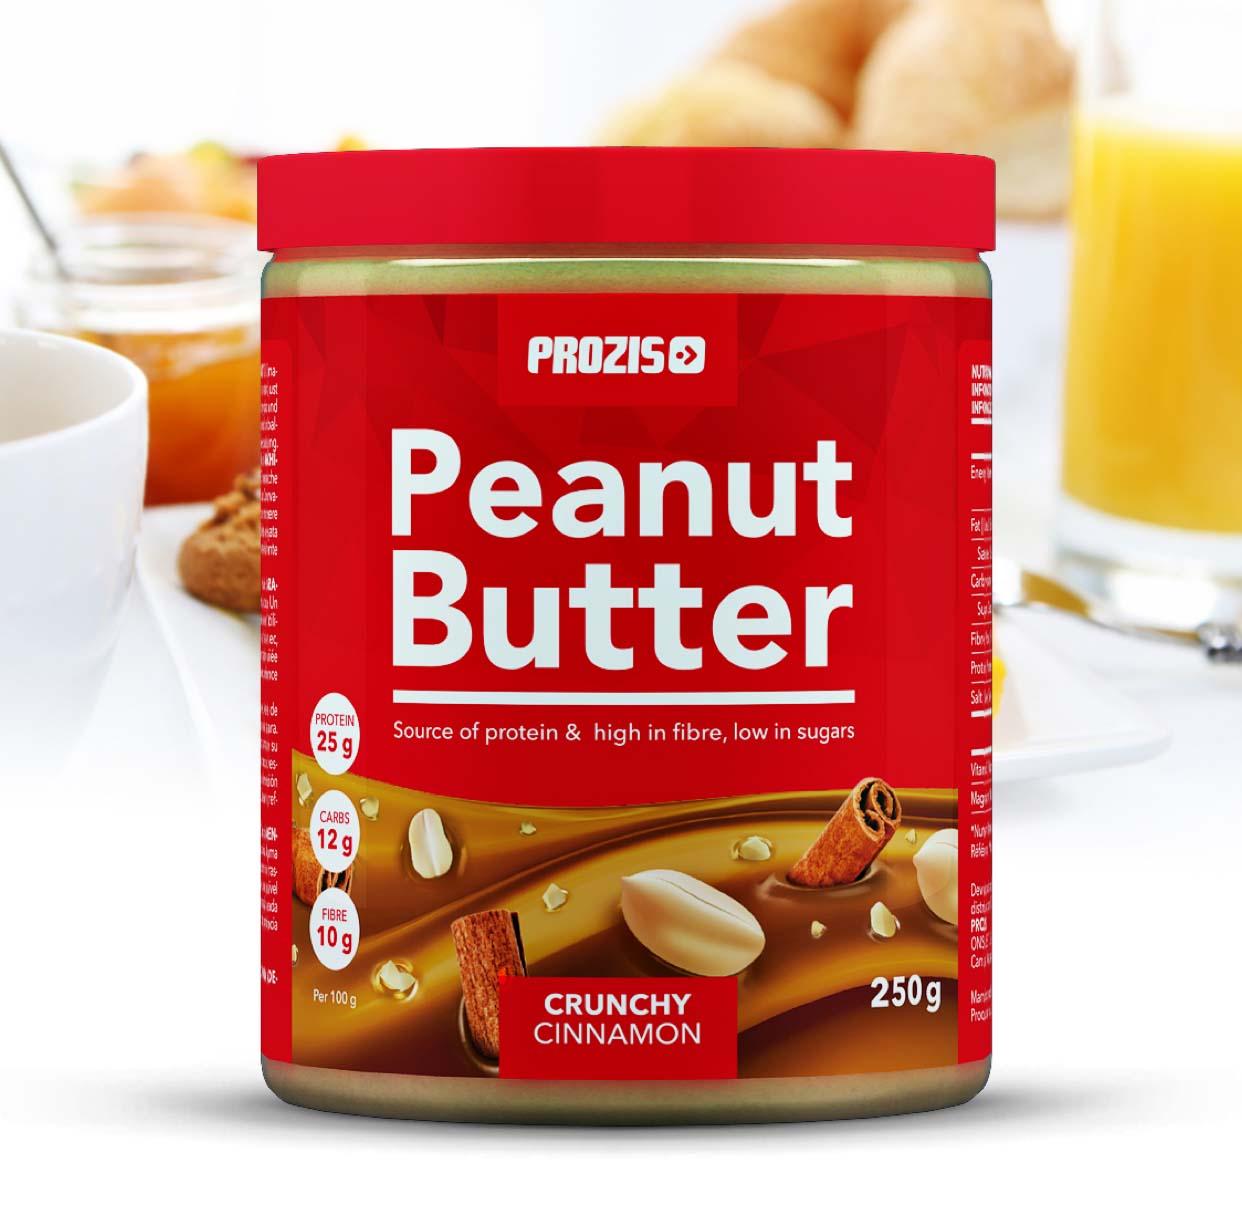 Prozis Peanut Butter Cinnamon